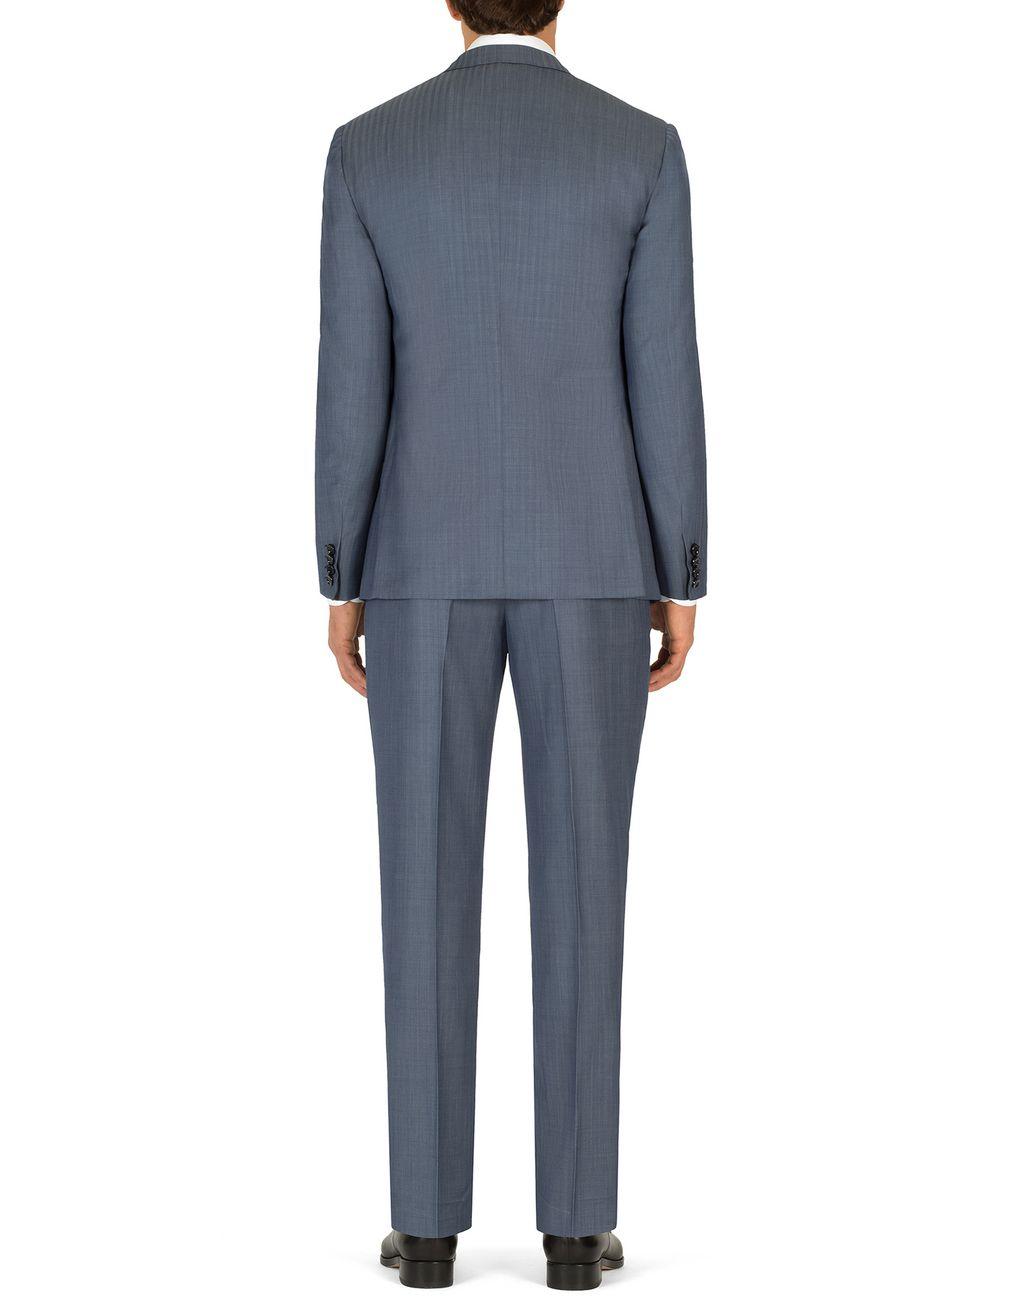 "BRIONI Голубой костюм Ravello с мелким узором ""в ёлочку""   Suits & Jackets Для Мужчин d"